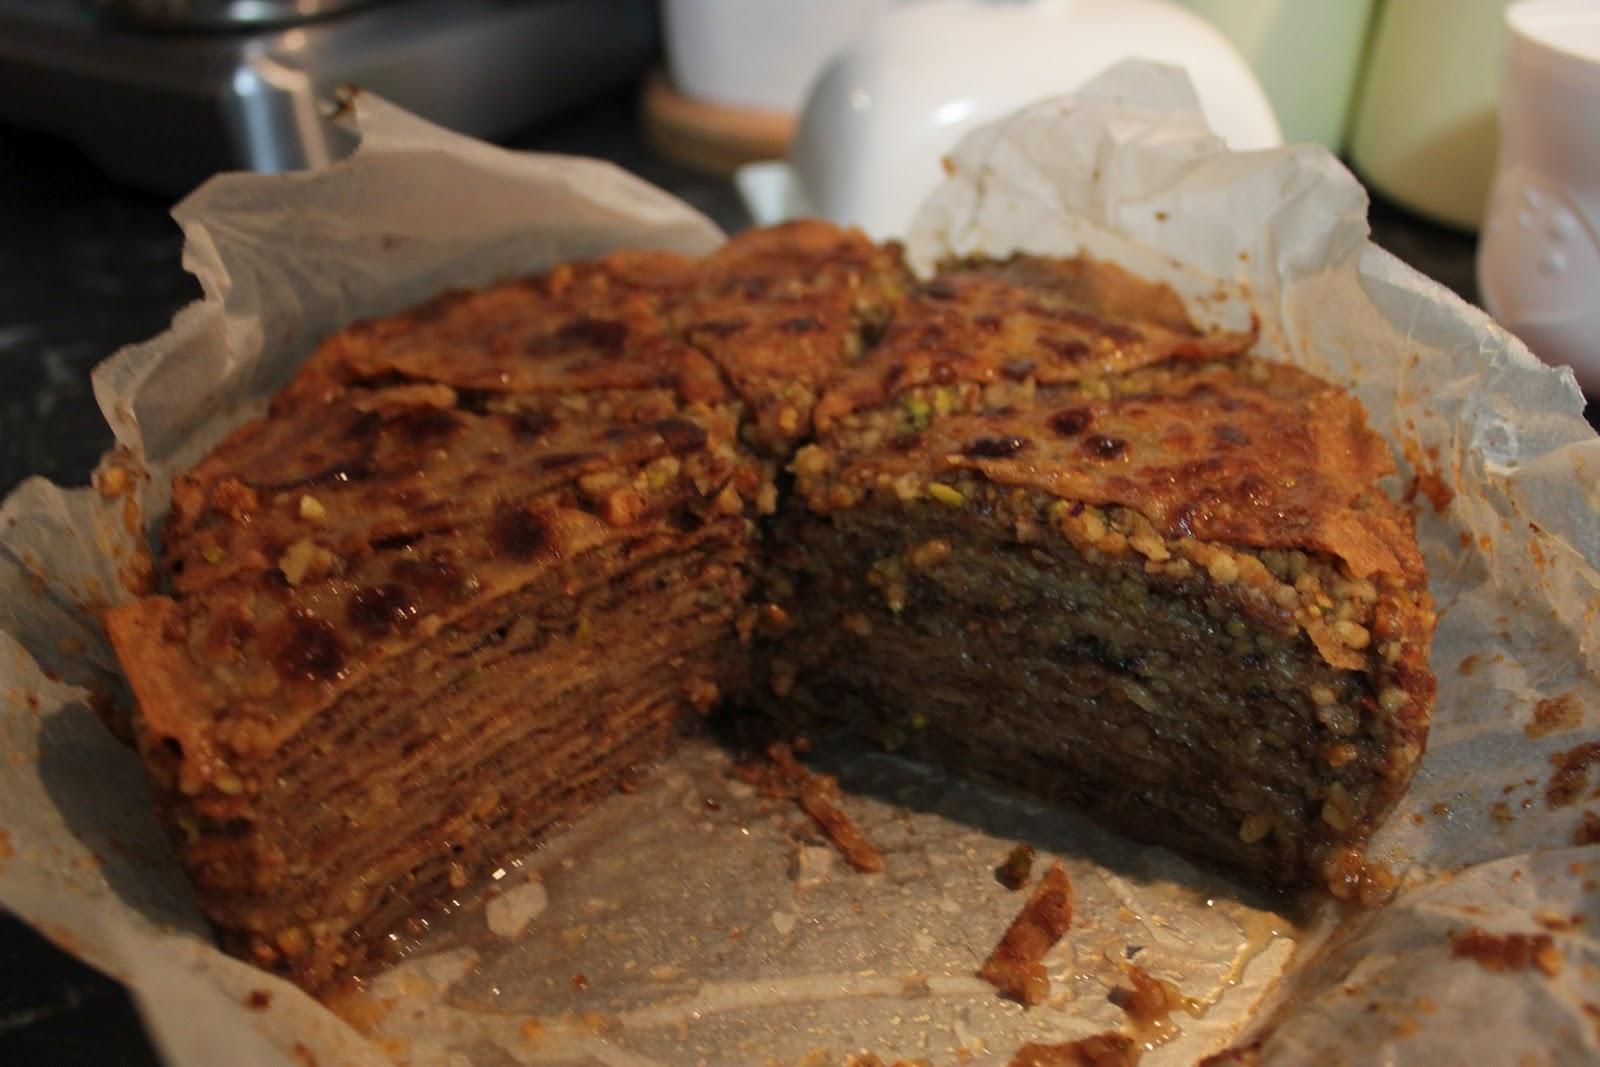 ... my way around the world: Turkey & Greece Part II - Baklava Crepe Cake